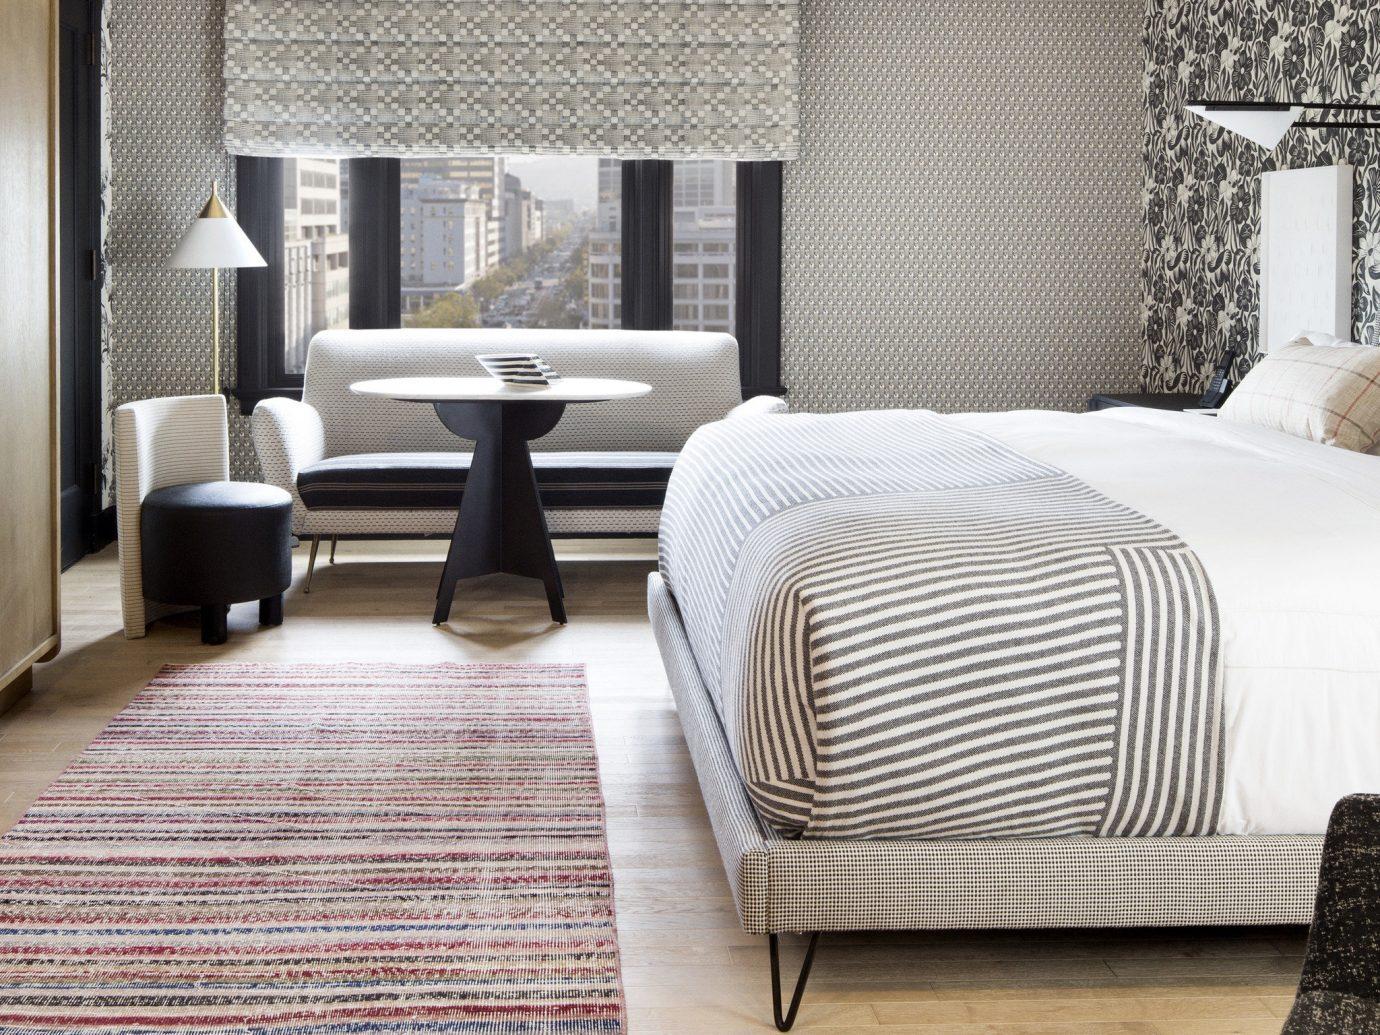 Bedroom at San Francisco Proper Hotel